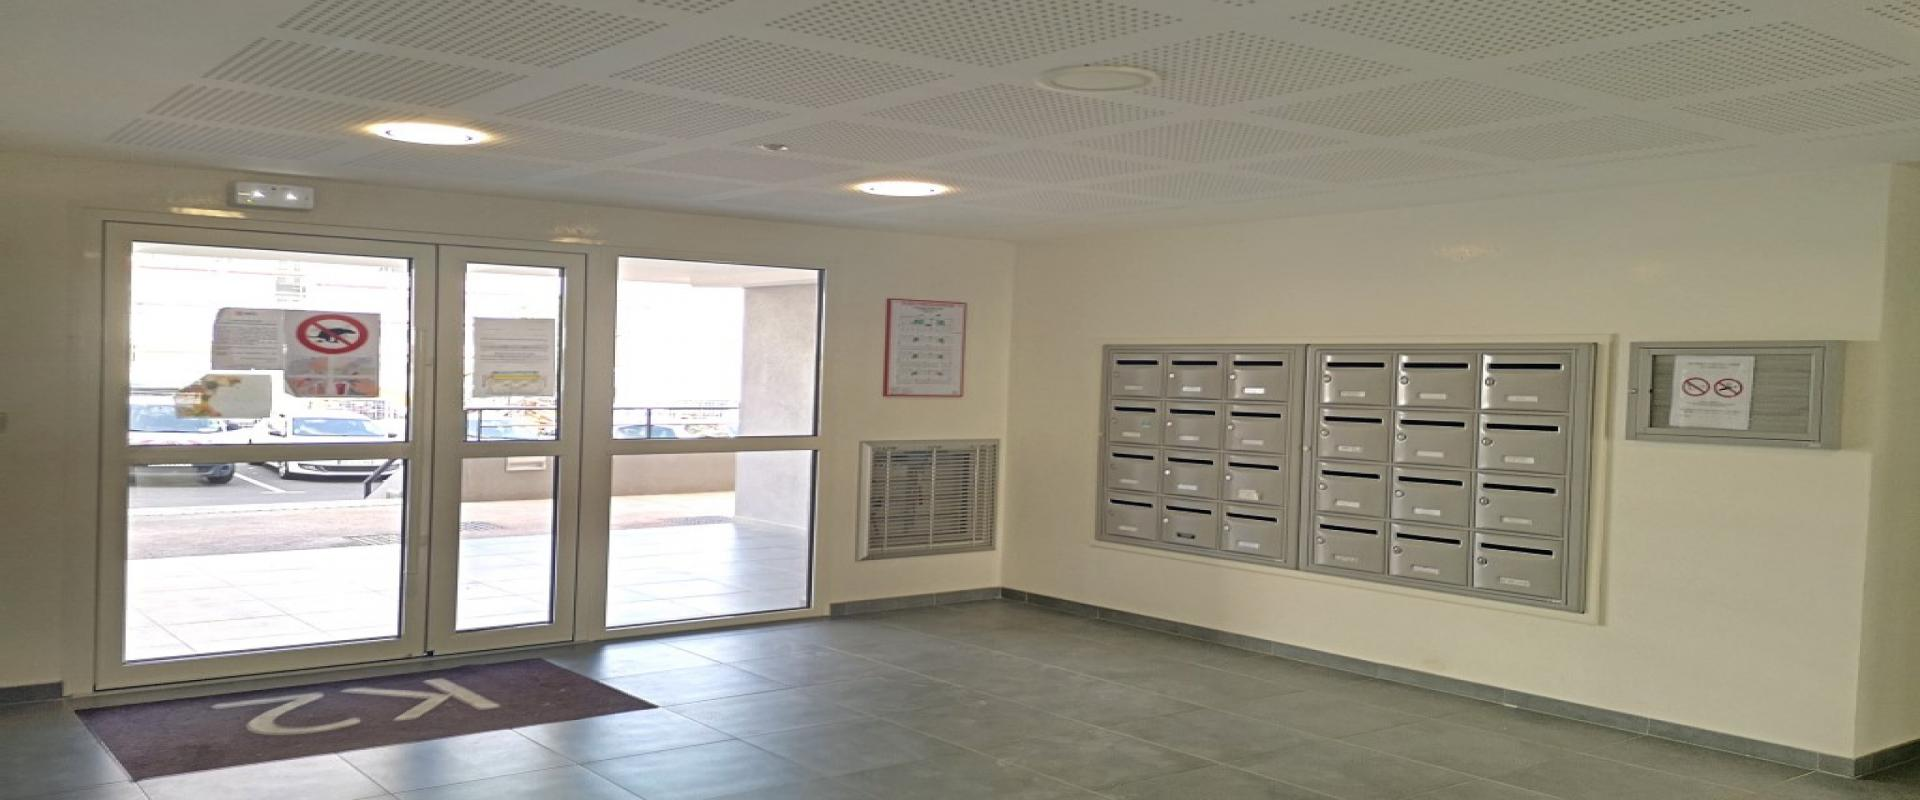 F3 neuf à louer Carré Bodiccione hall immeuble